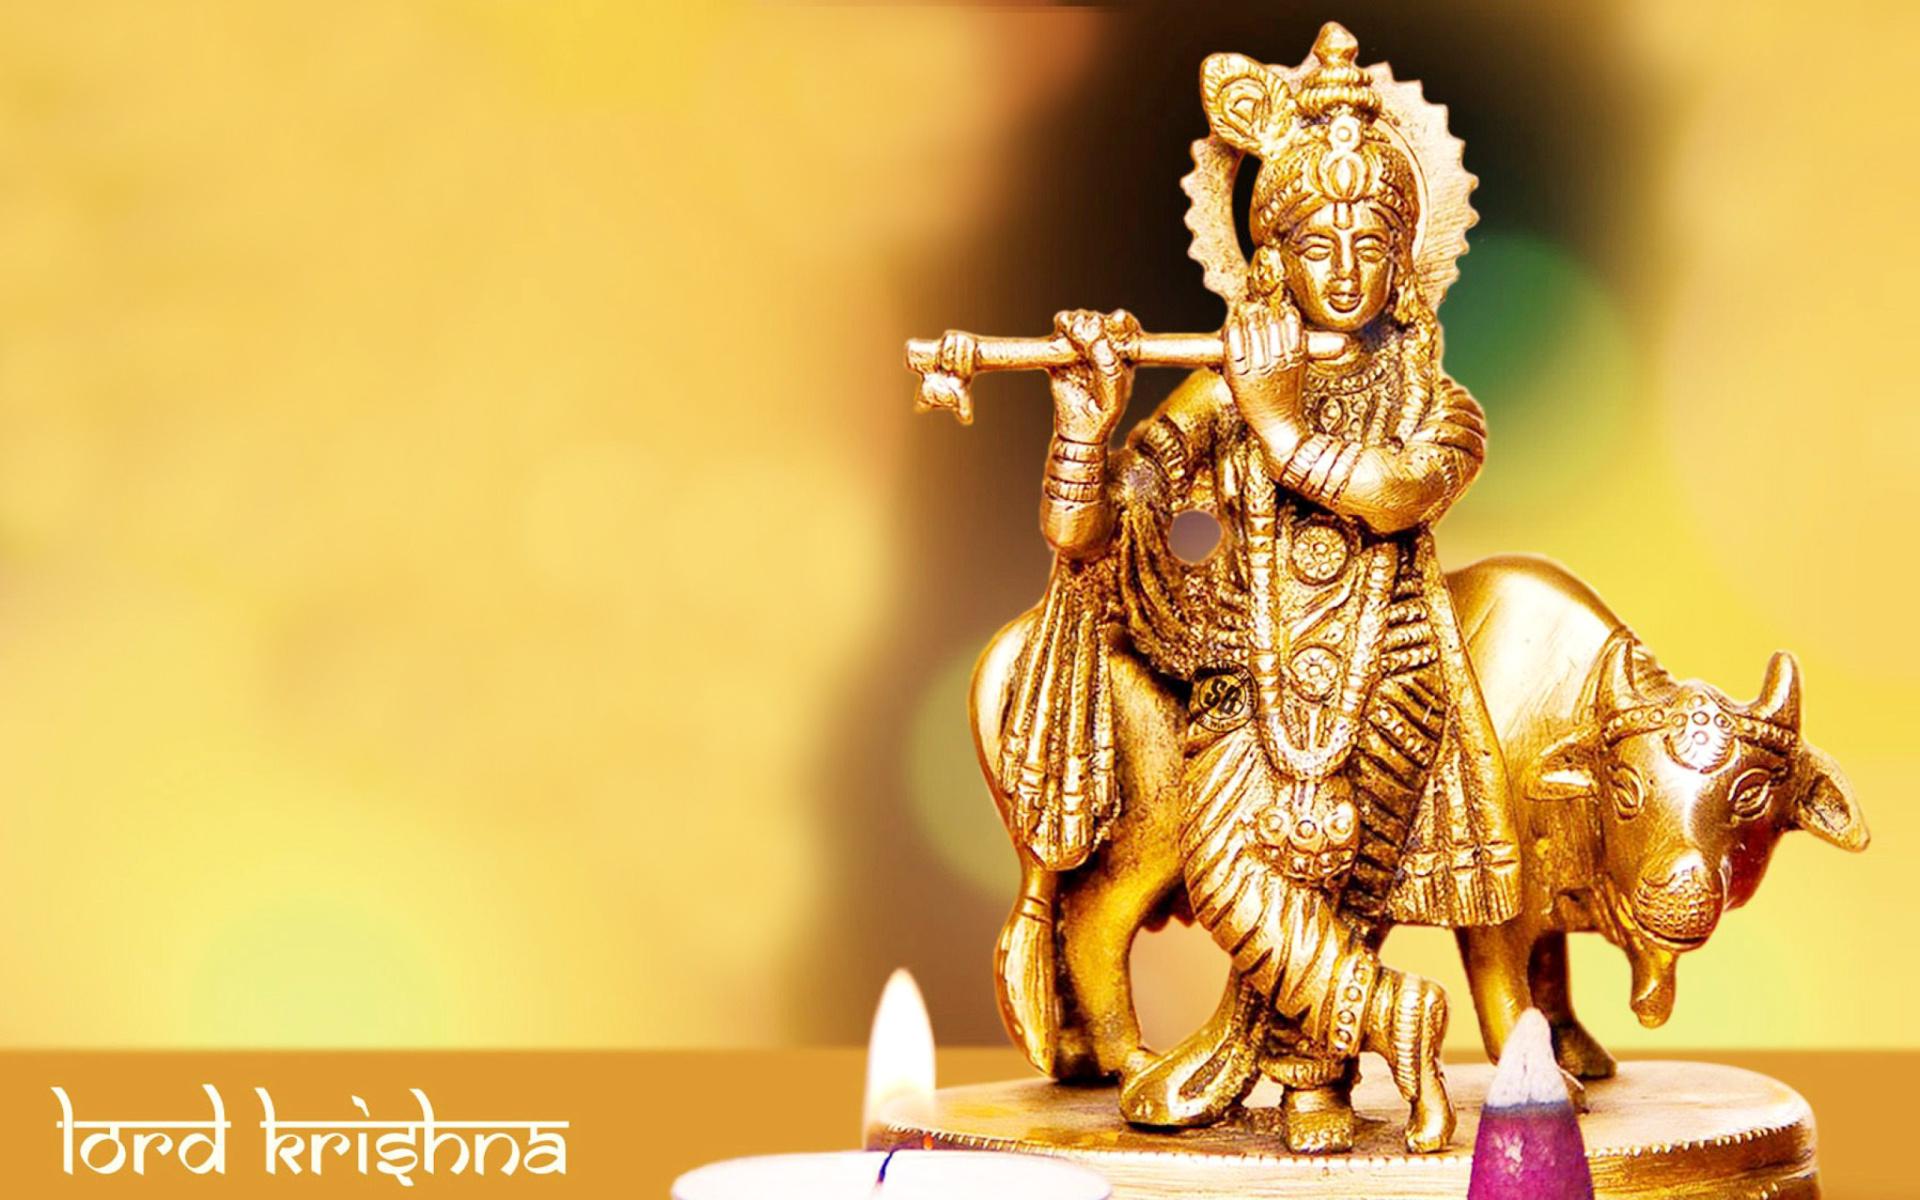 Wallpaper For Pc Krishna